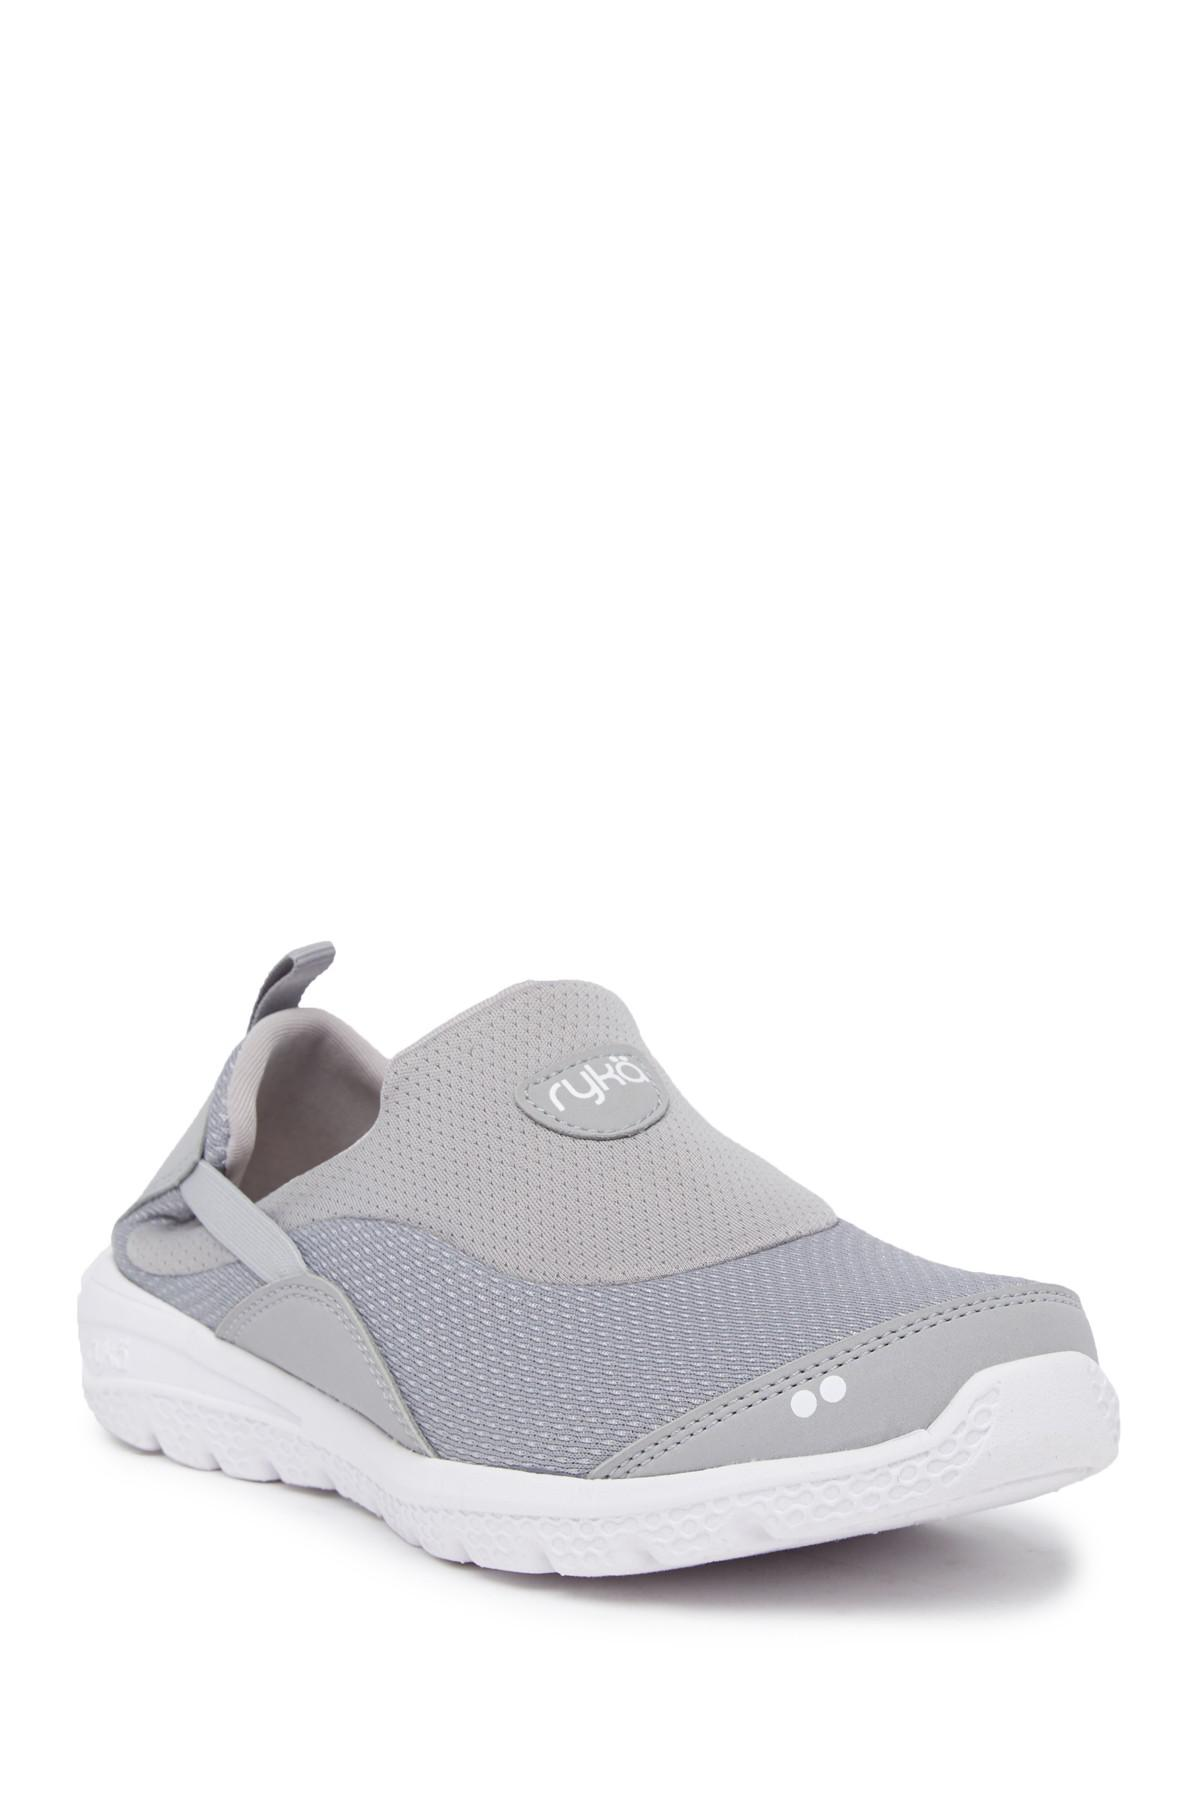 Ryka Helena Slip-On Sneaker ax7z1